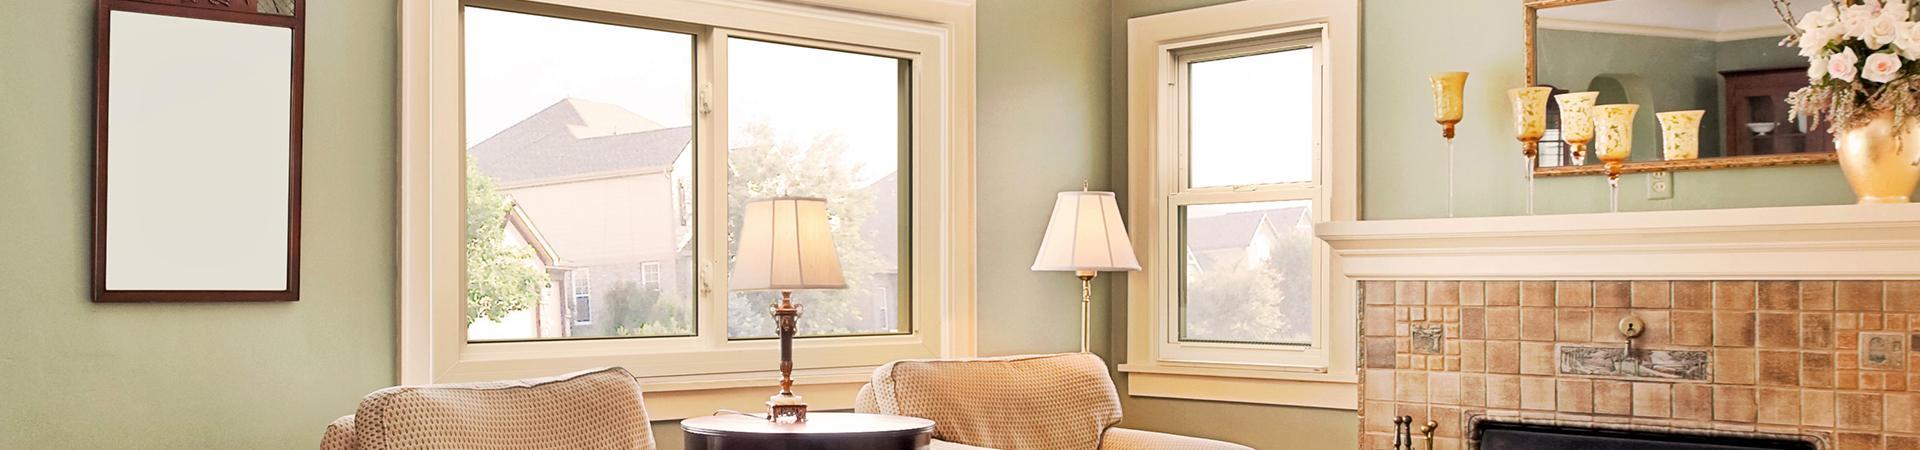 Sliding Window Replacement In Raleigh Durham North Carolina